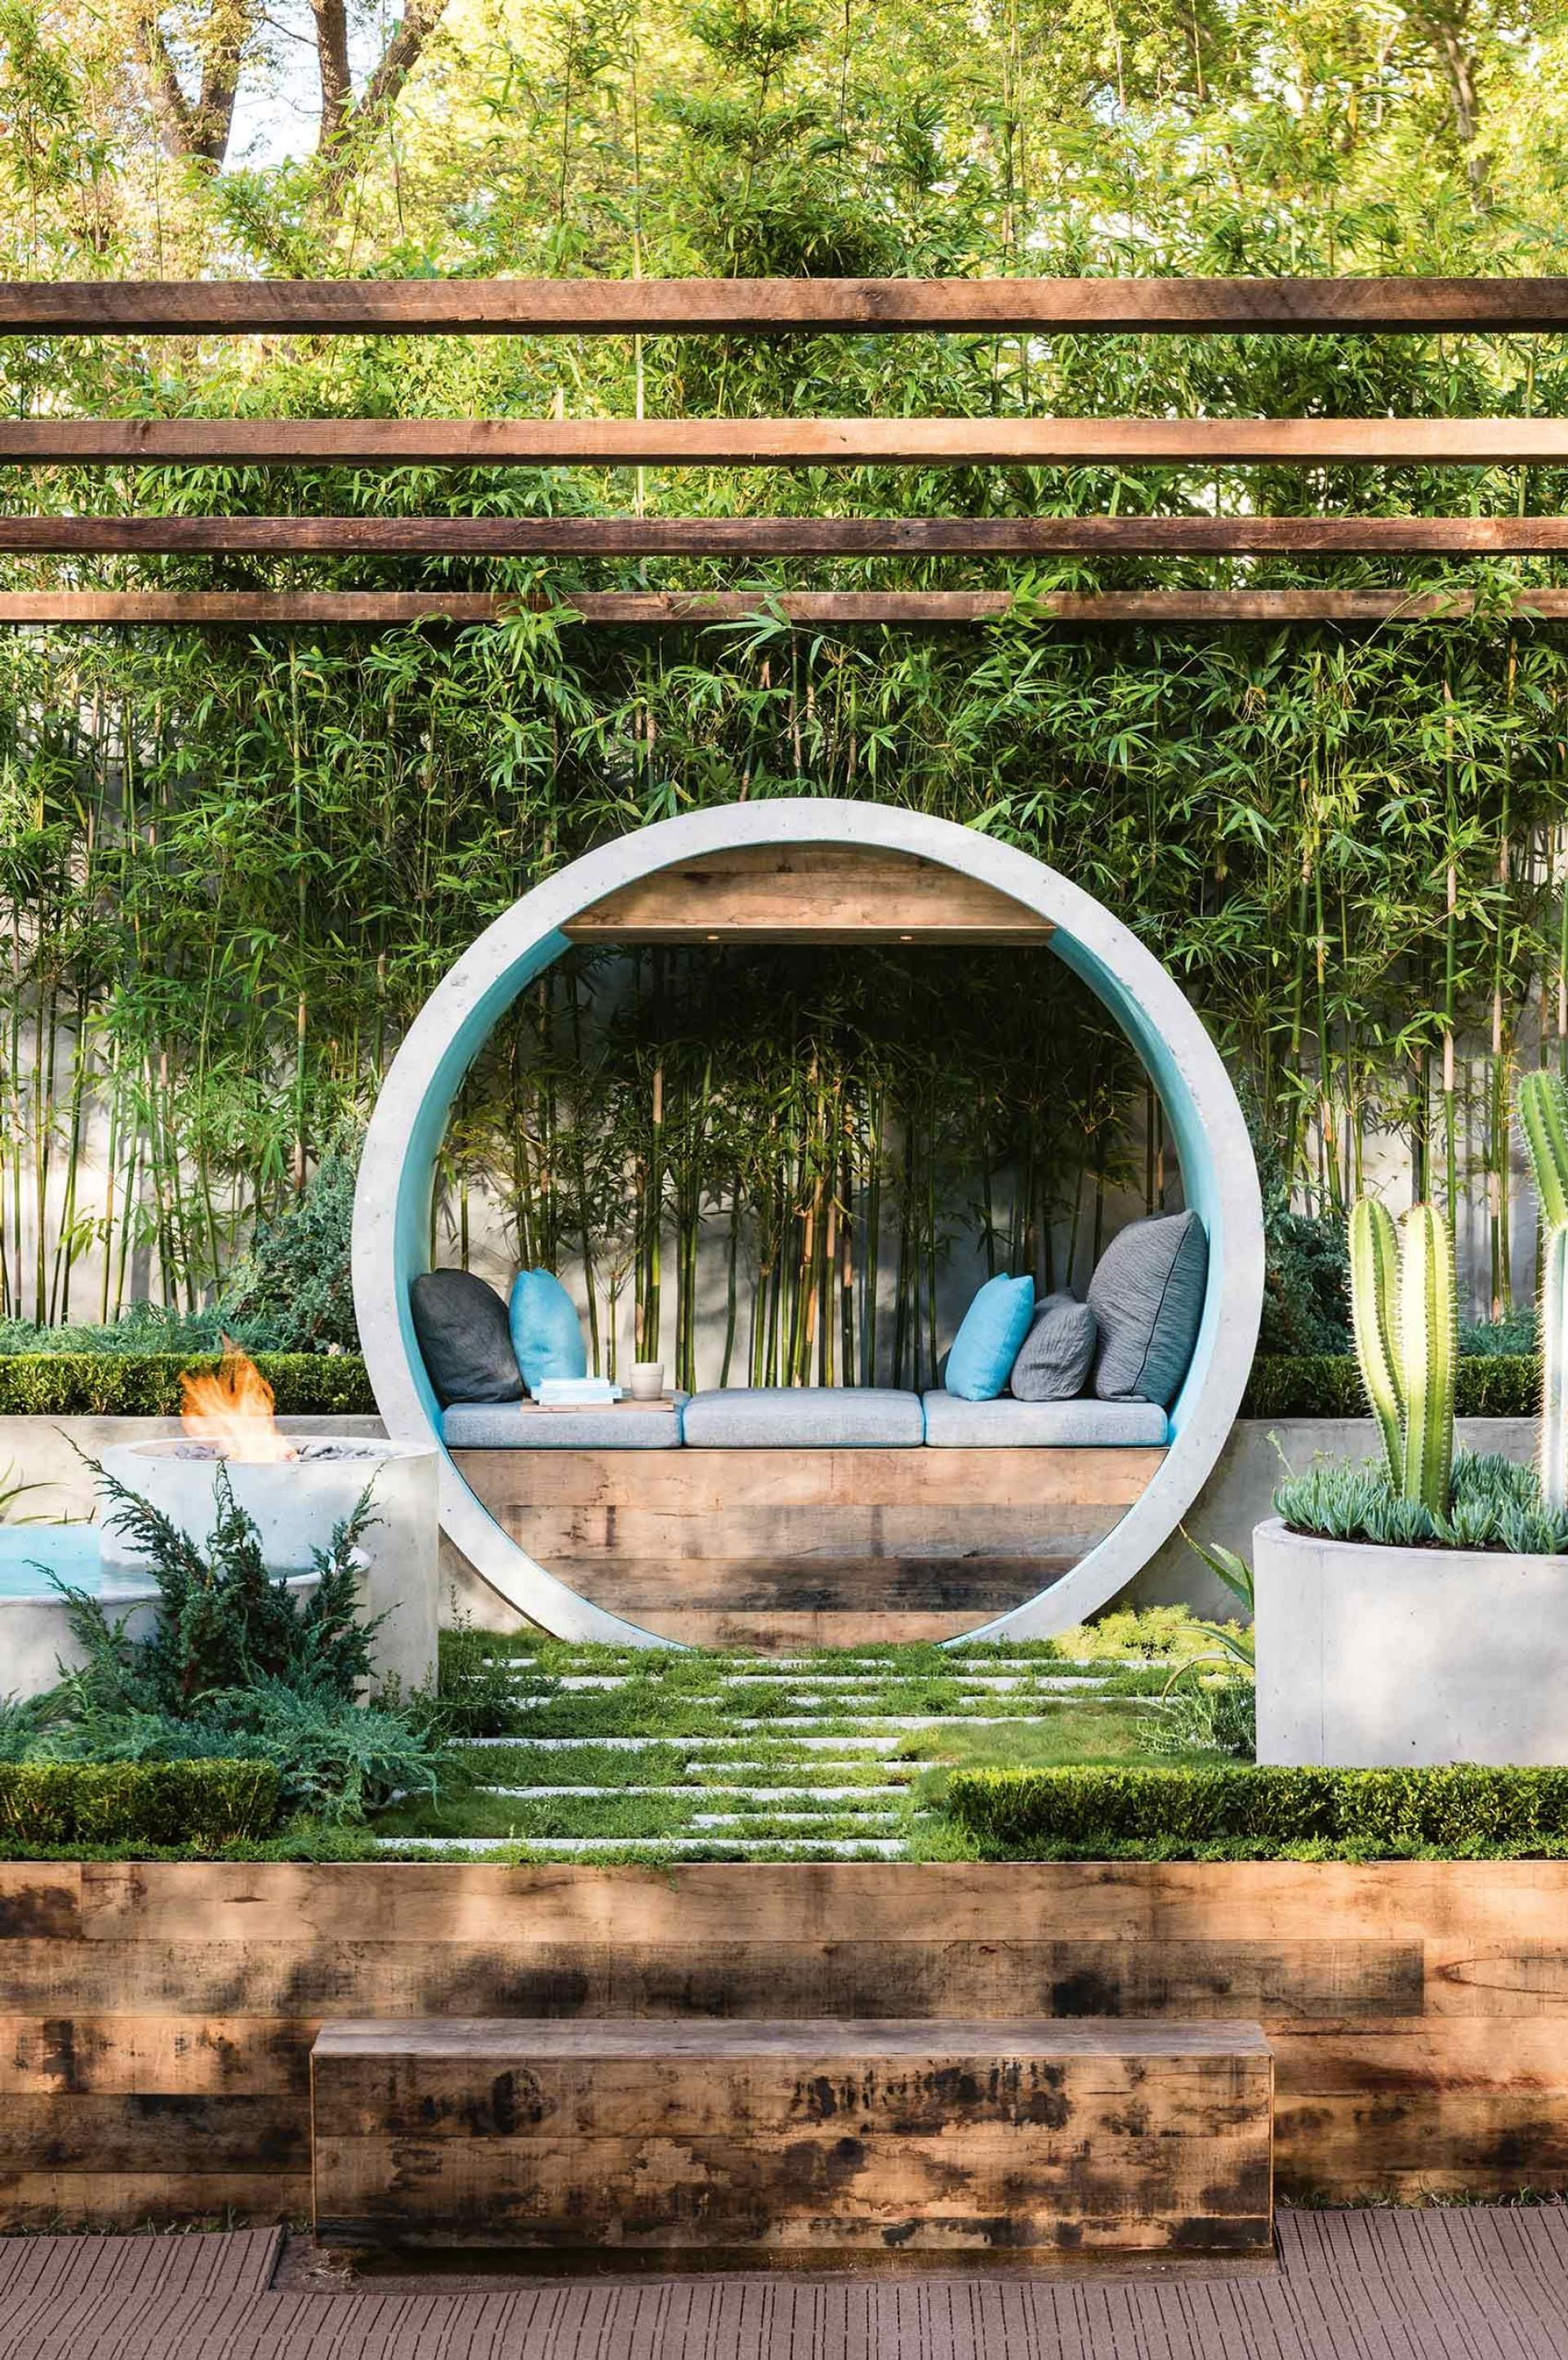 Bambus garten design  Stunning modern garden design with a circular seat and bamboo all ...